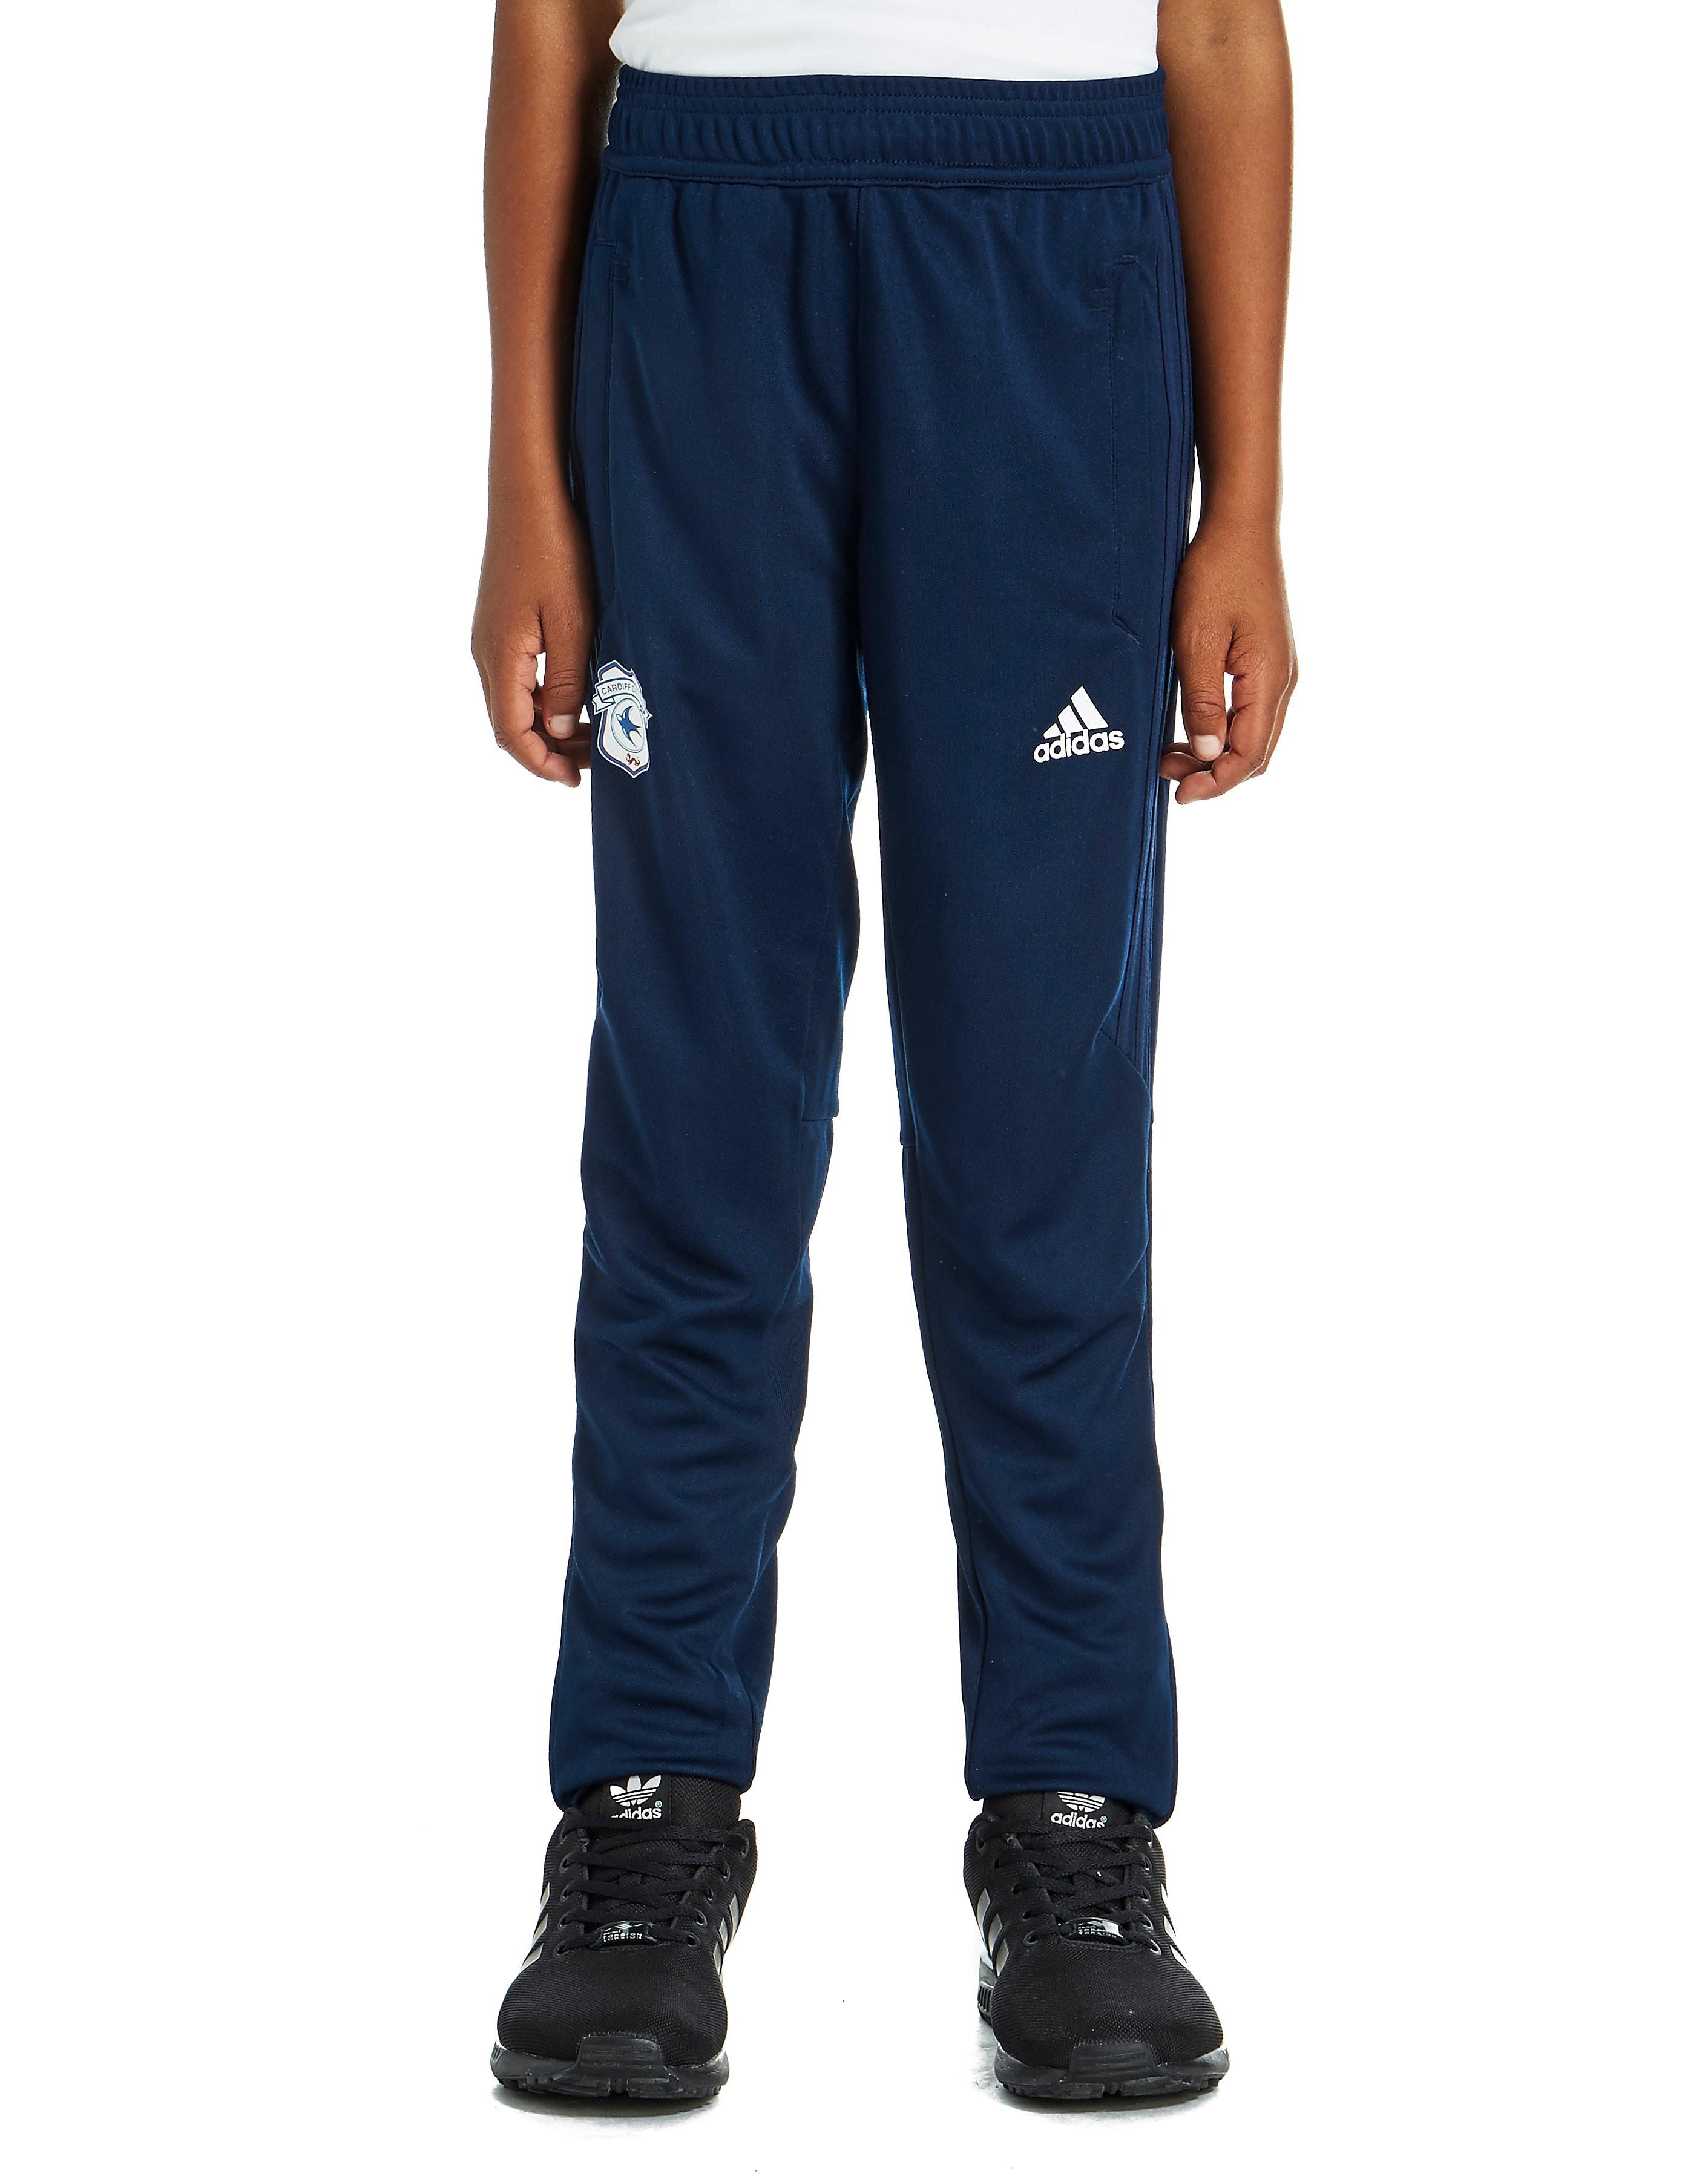 adidas Cardiff City 2017 Training Pants Junior